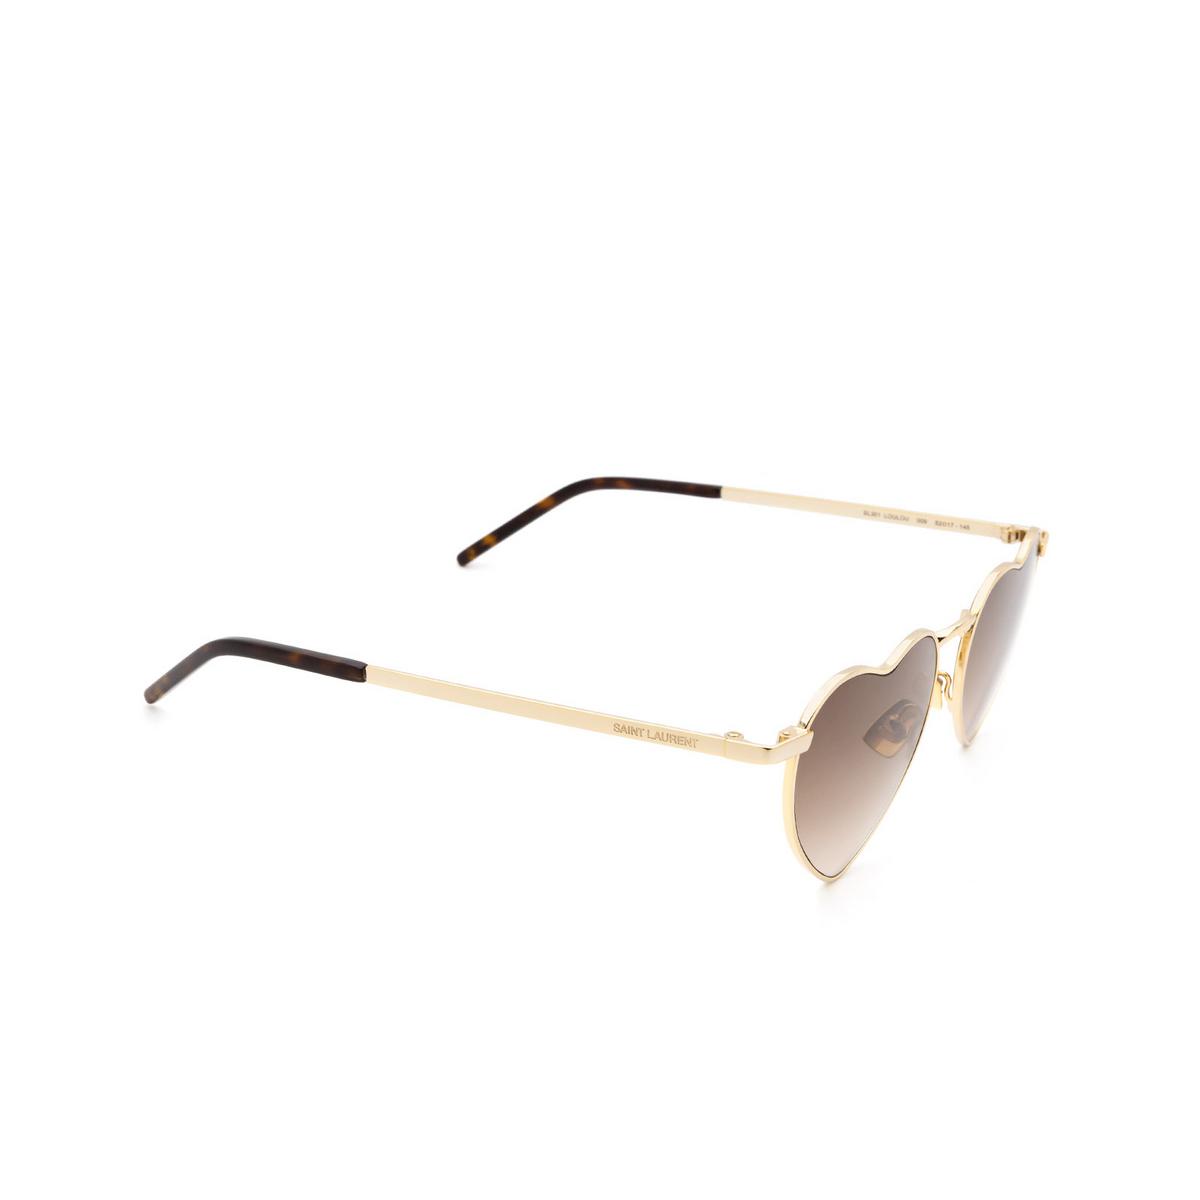 Saint Laurent® Irregular Sunglasses: Loulou SL 301 color Gold 009 - three-quarters view.